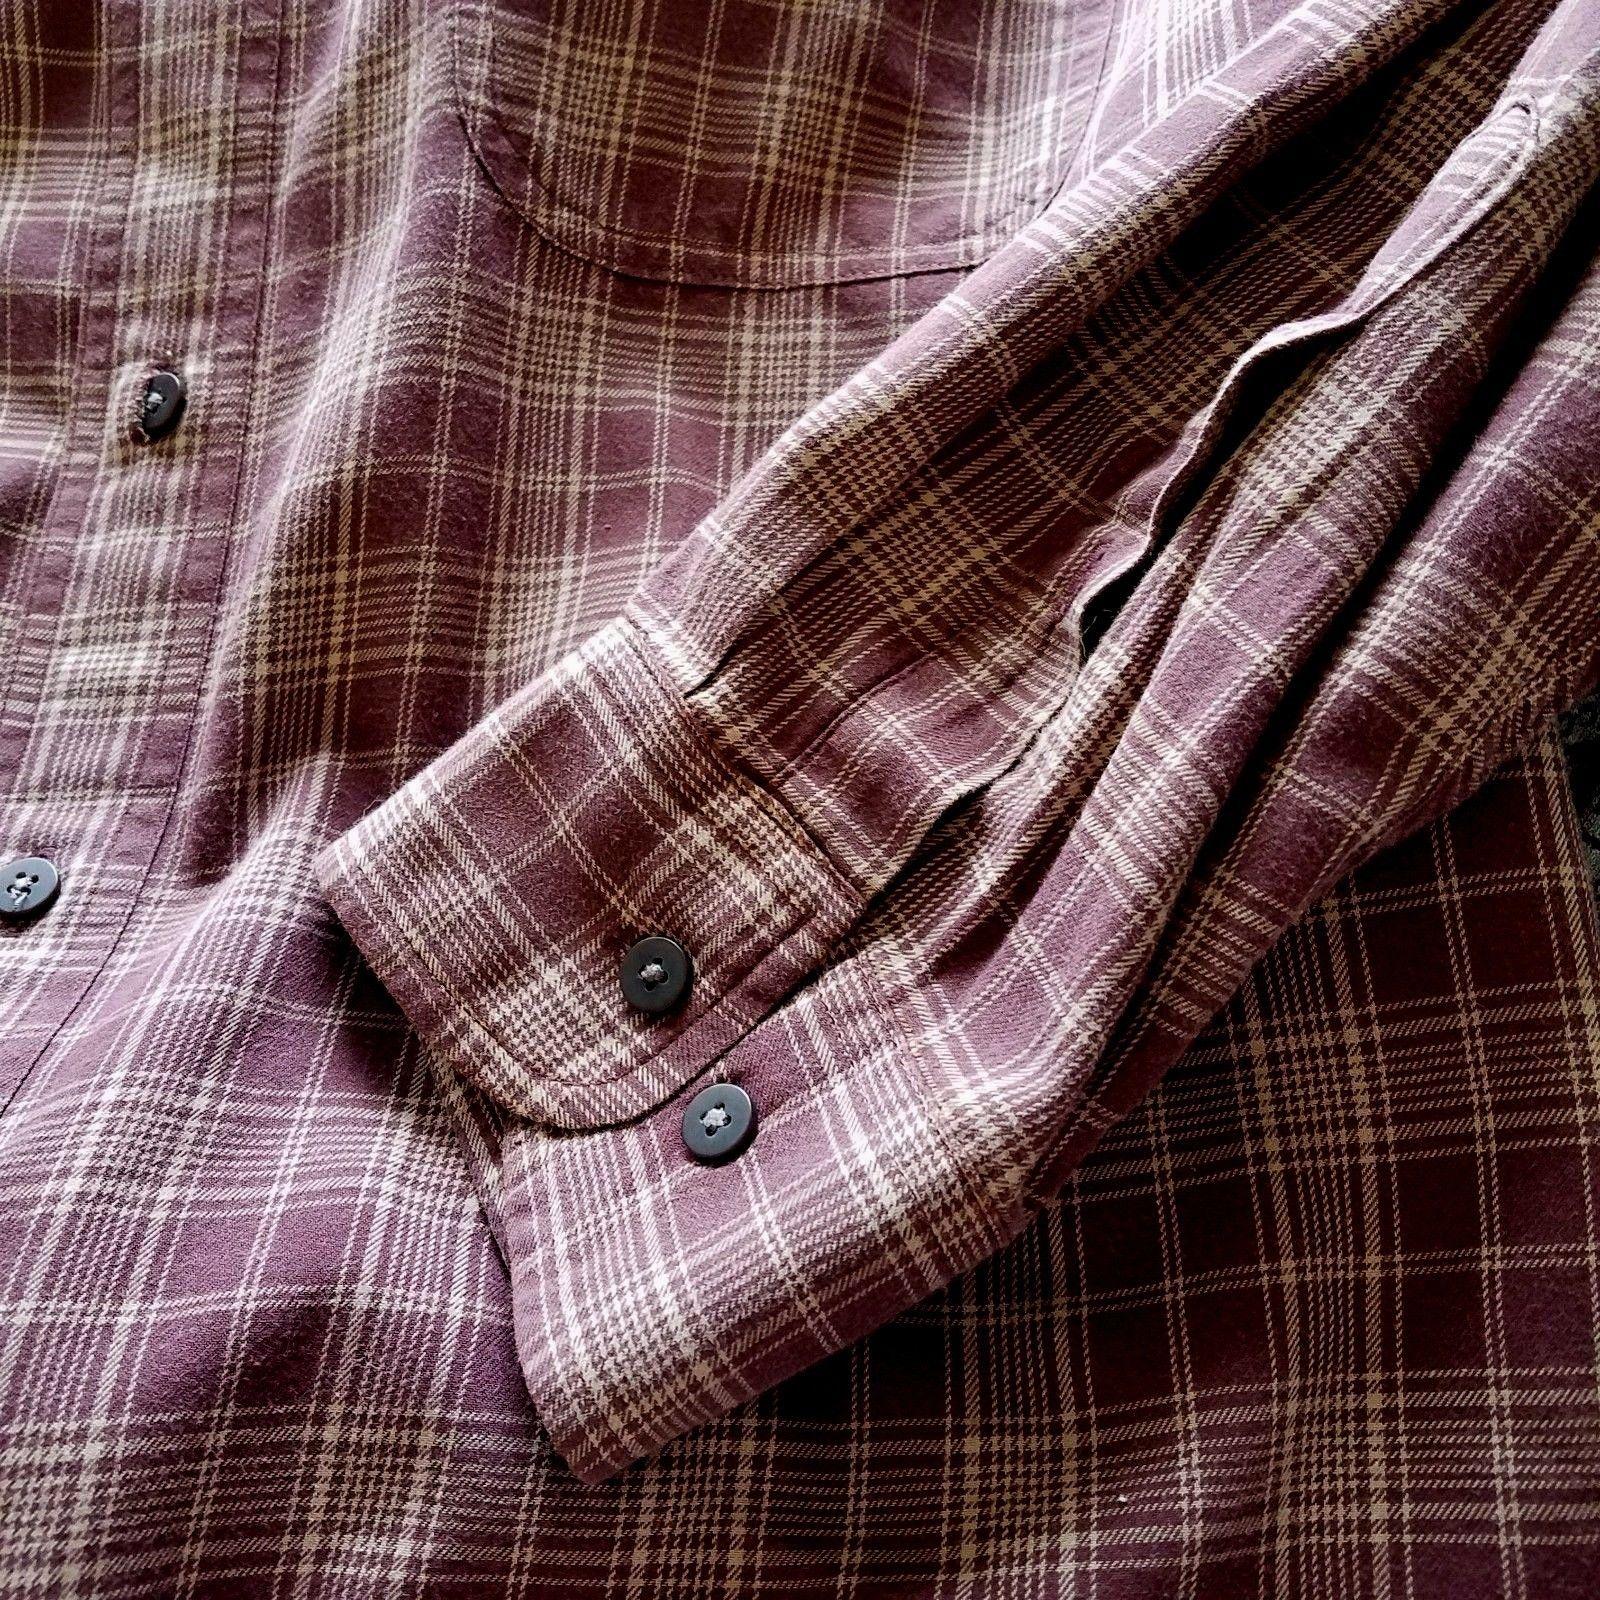 Timberland Brown Plaid Button Down Shirt Long Sleeve Lightweight Size Large